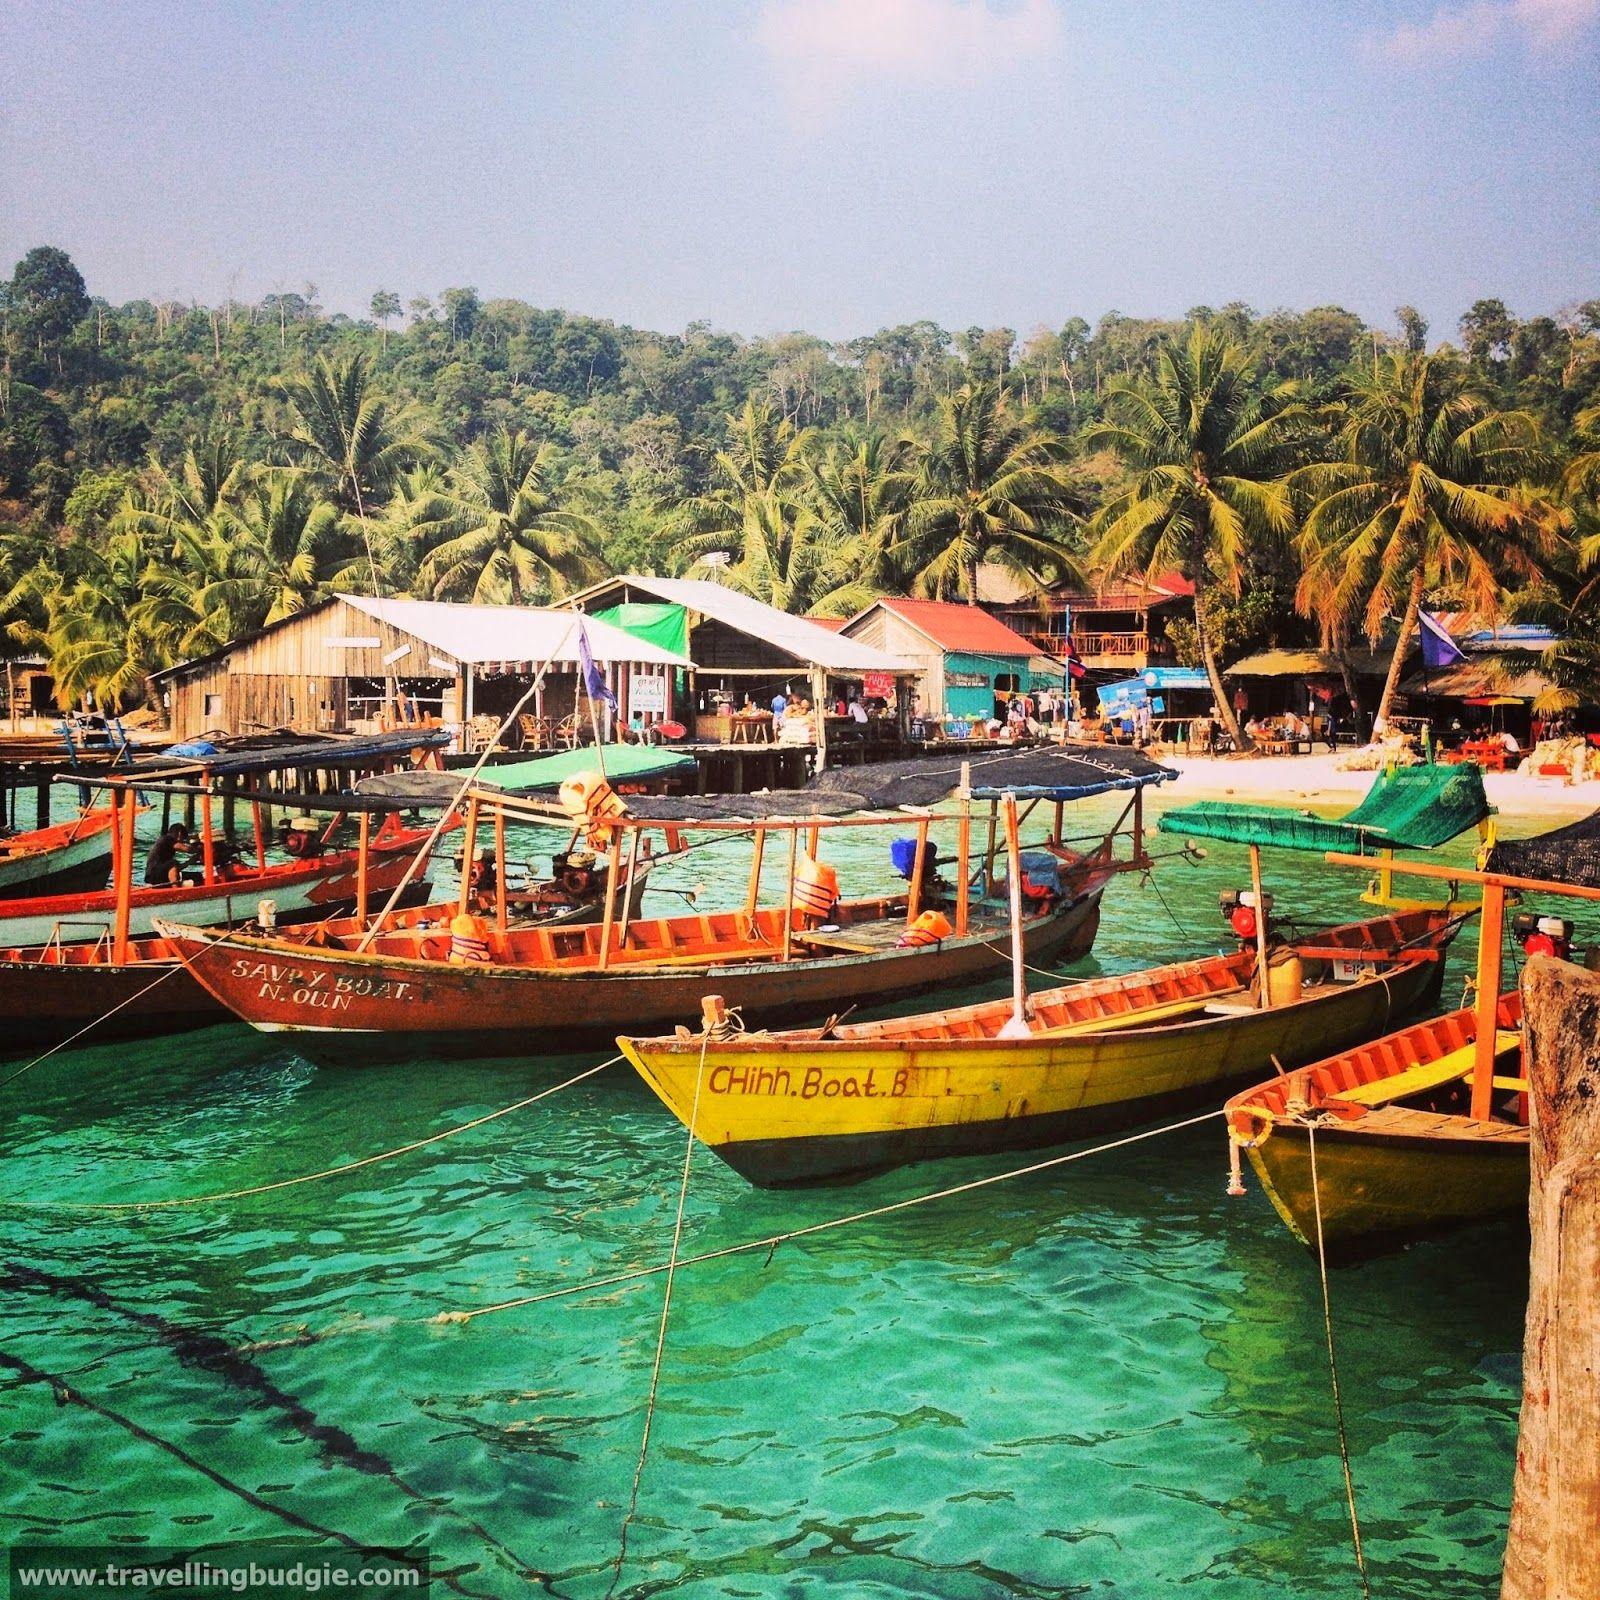 Cambodia: Beach Times And Island Paradise